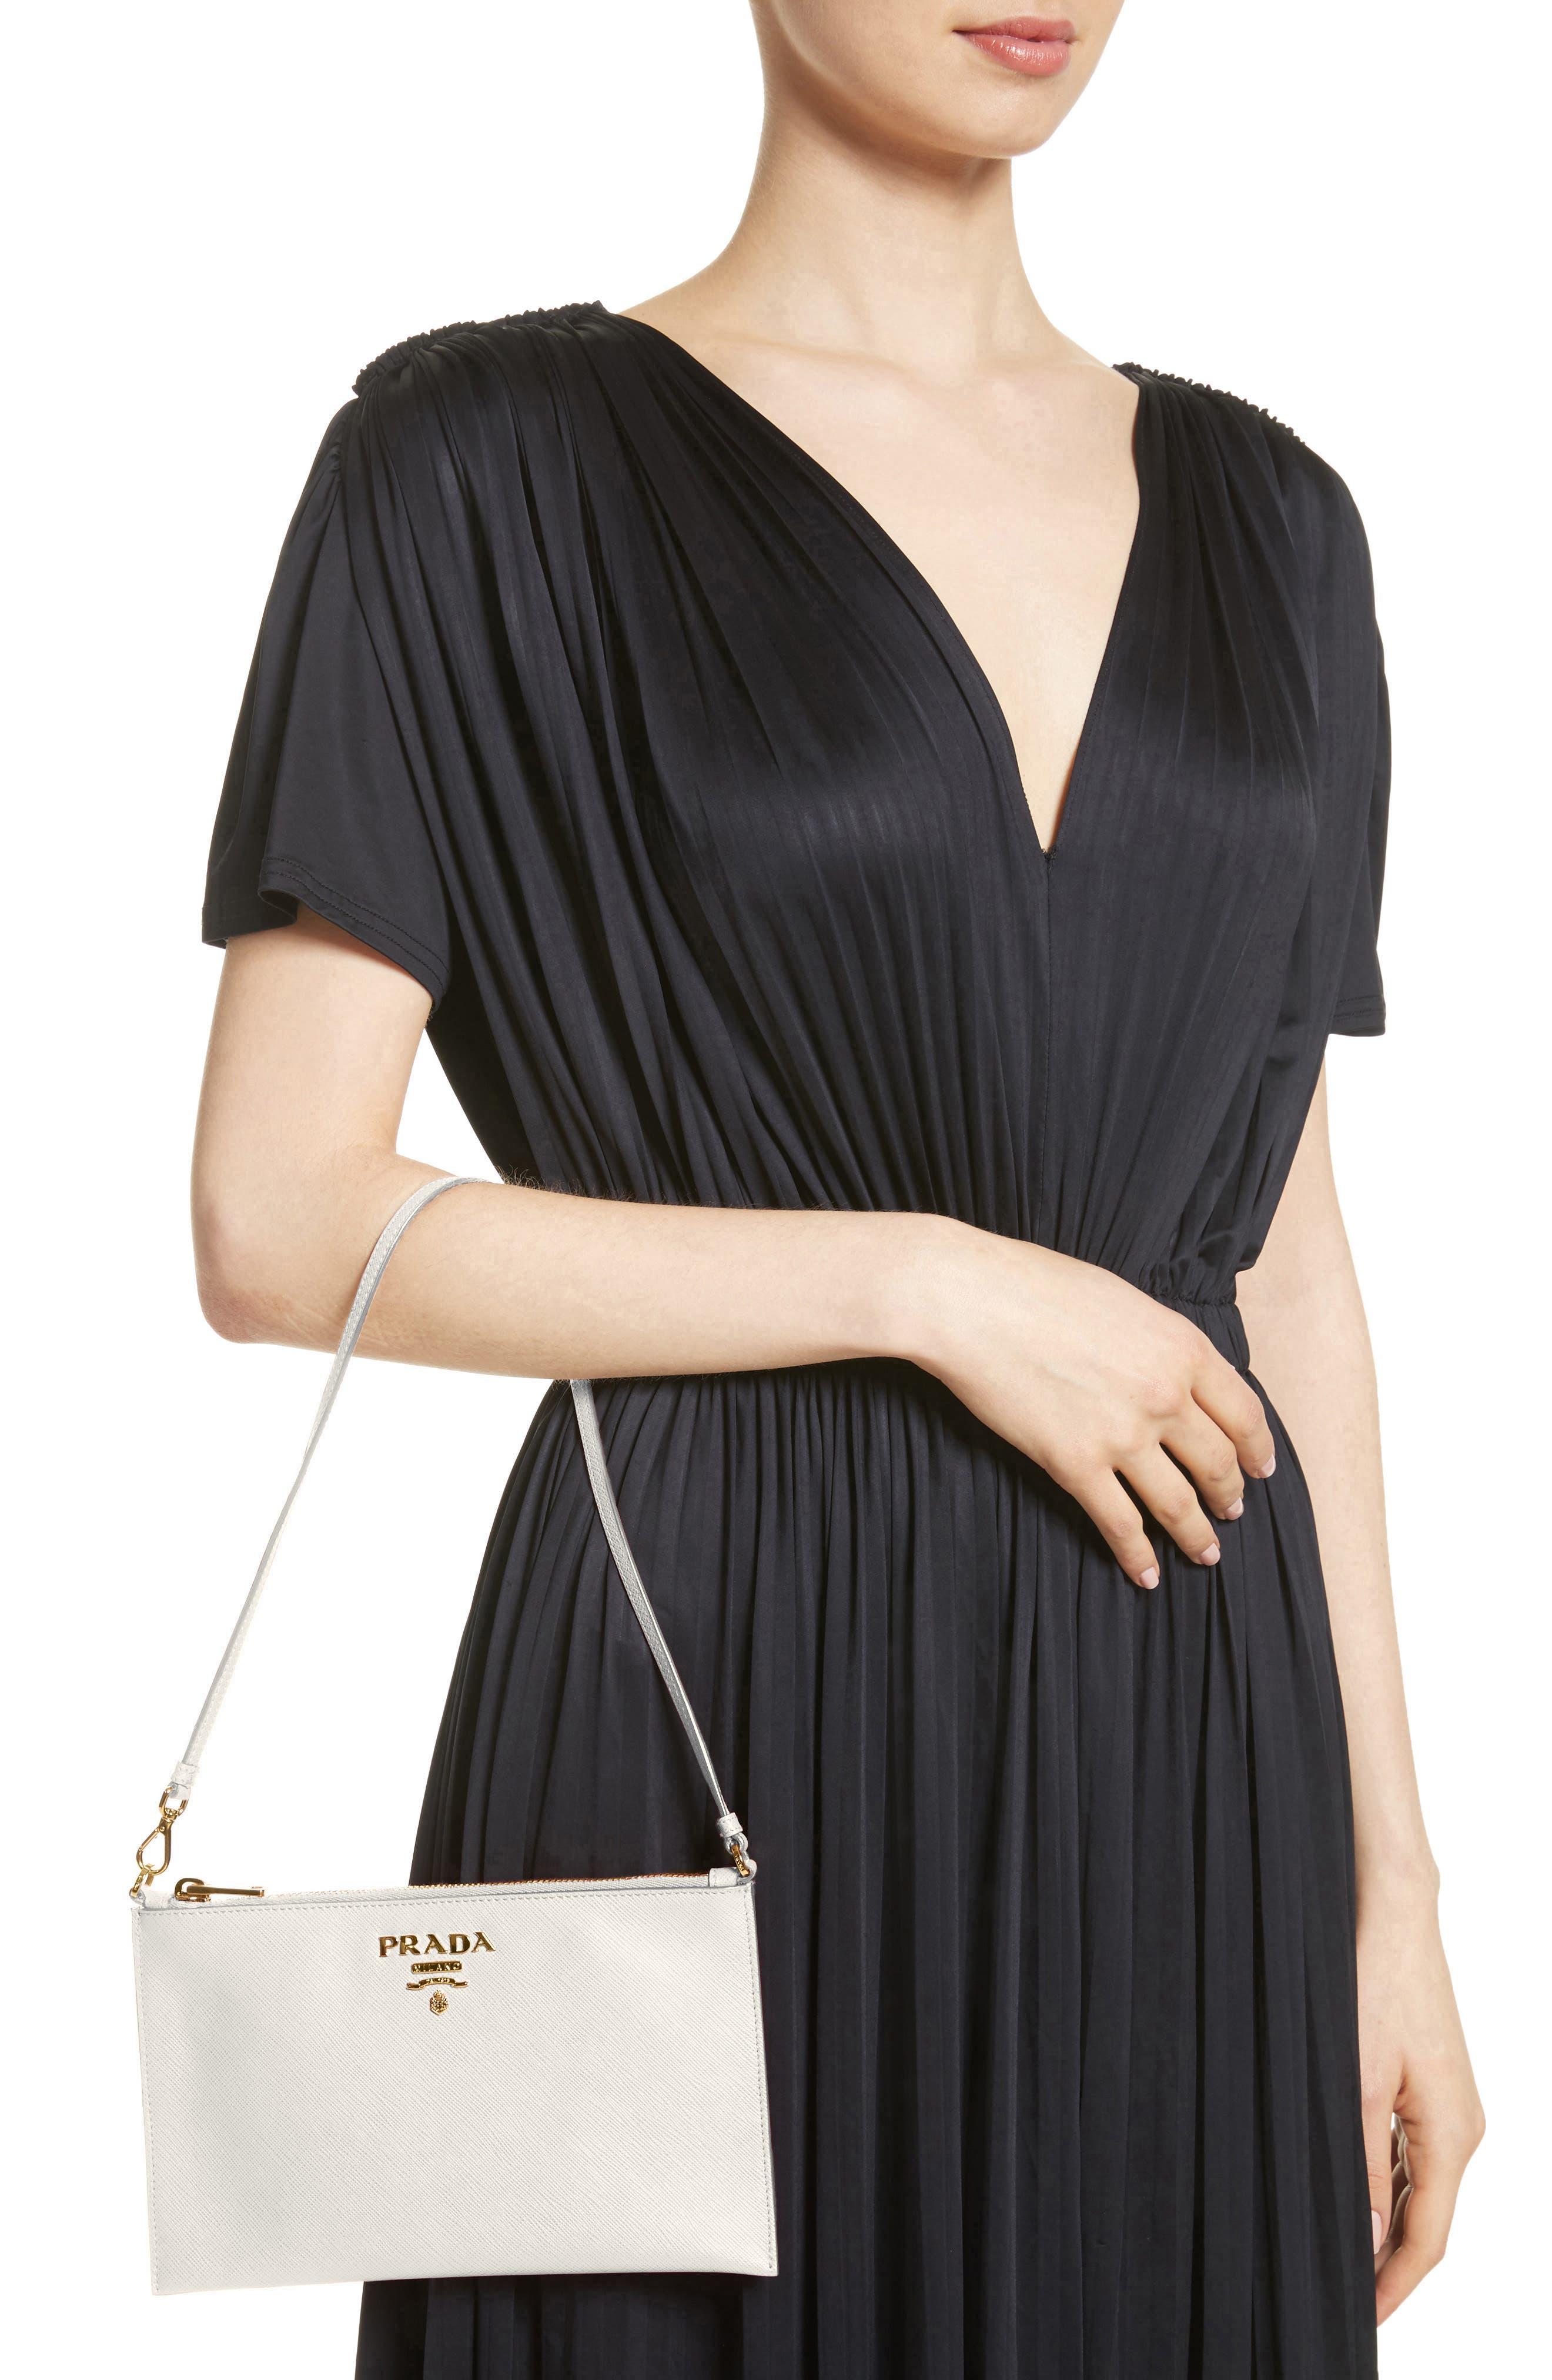 Saffiano Leather Shoulder Bag,                             Alternate thumbnail 2, color,                             F0009 Bianco